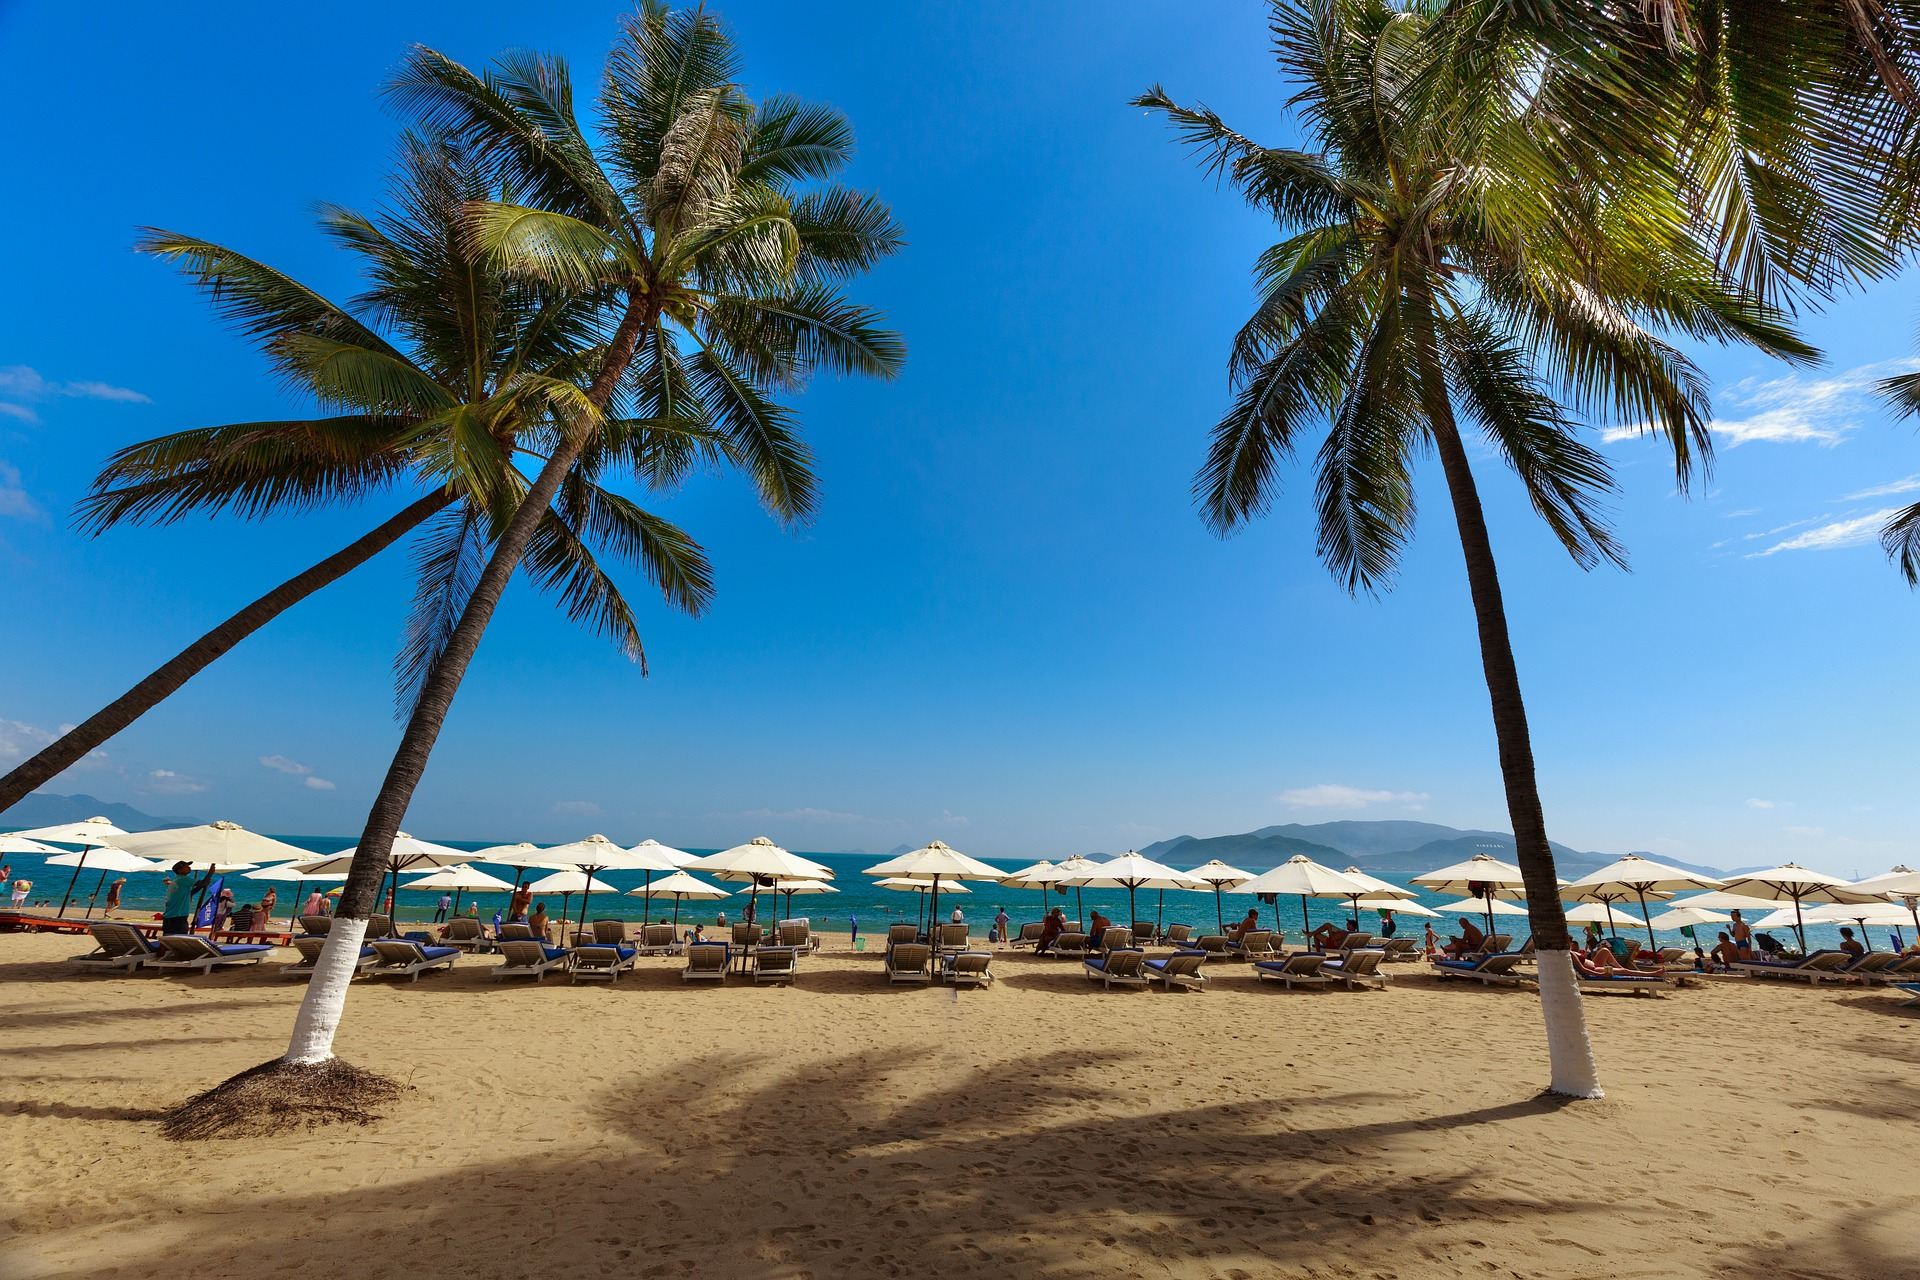 Ho Chi Minh Vietnam ab 249,50€ bist du am Strand Top 10